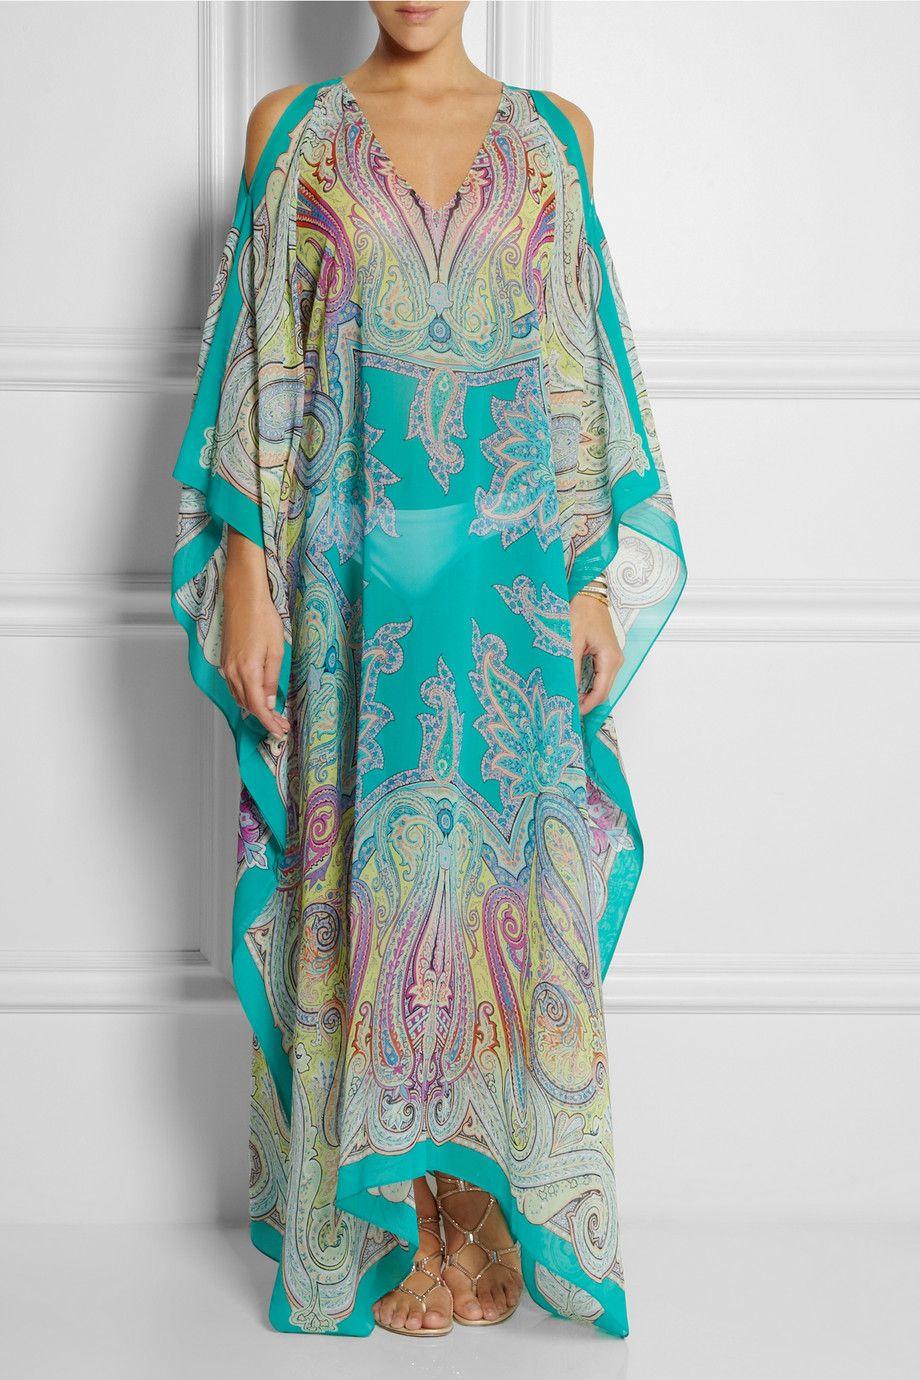 Silk Kaftan Watercolour Print Silk Dress Kaftan for women Luxury Kaftan Blue Silk Kaftan Dress